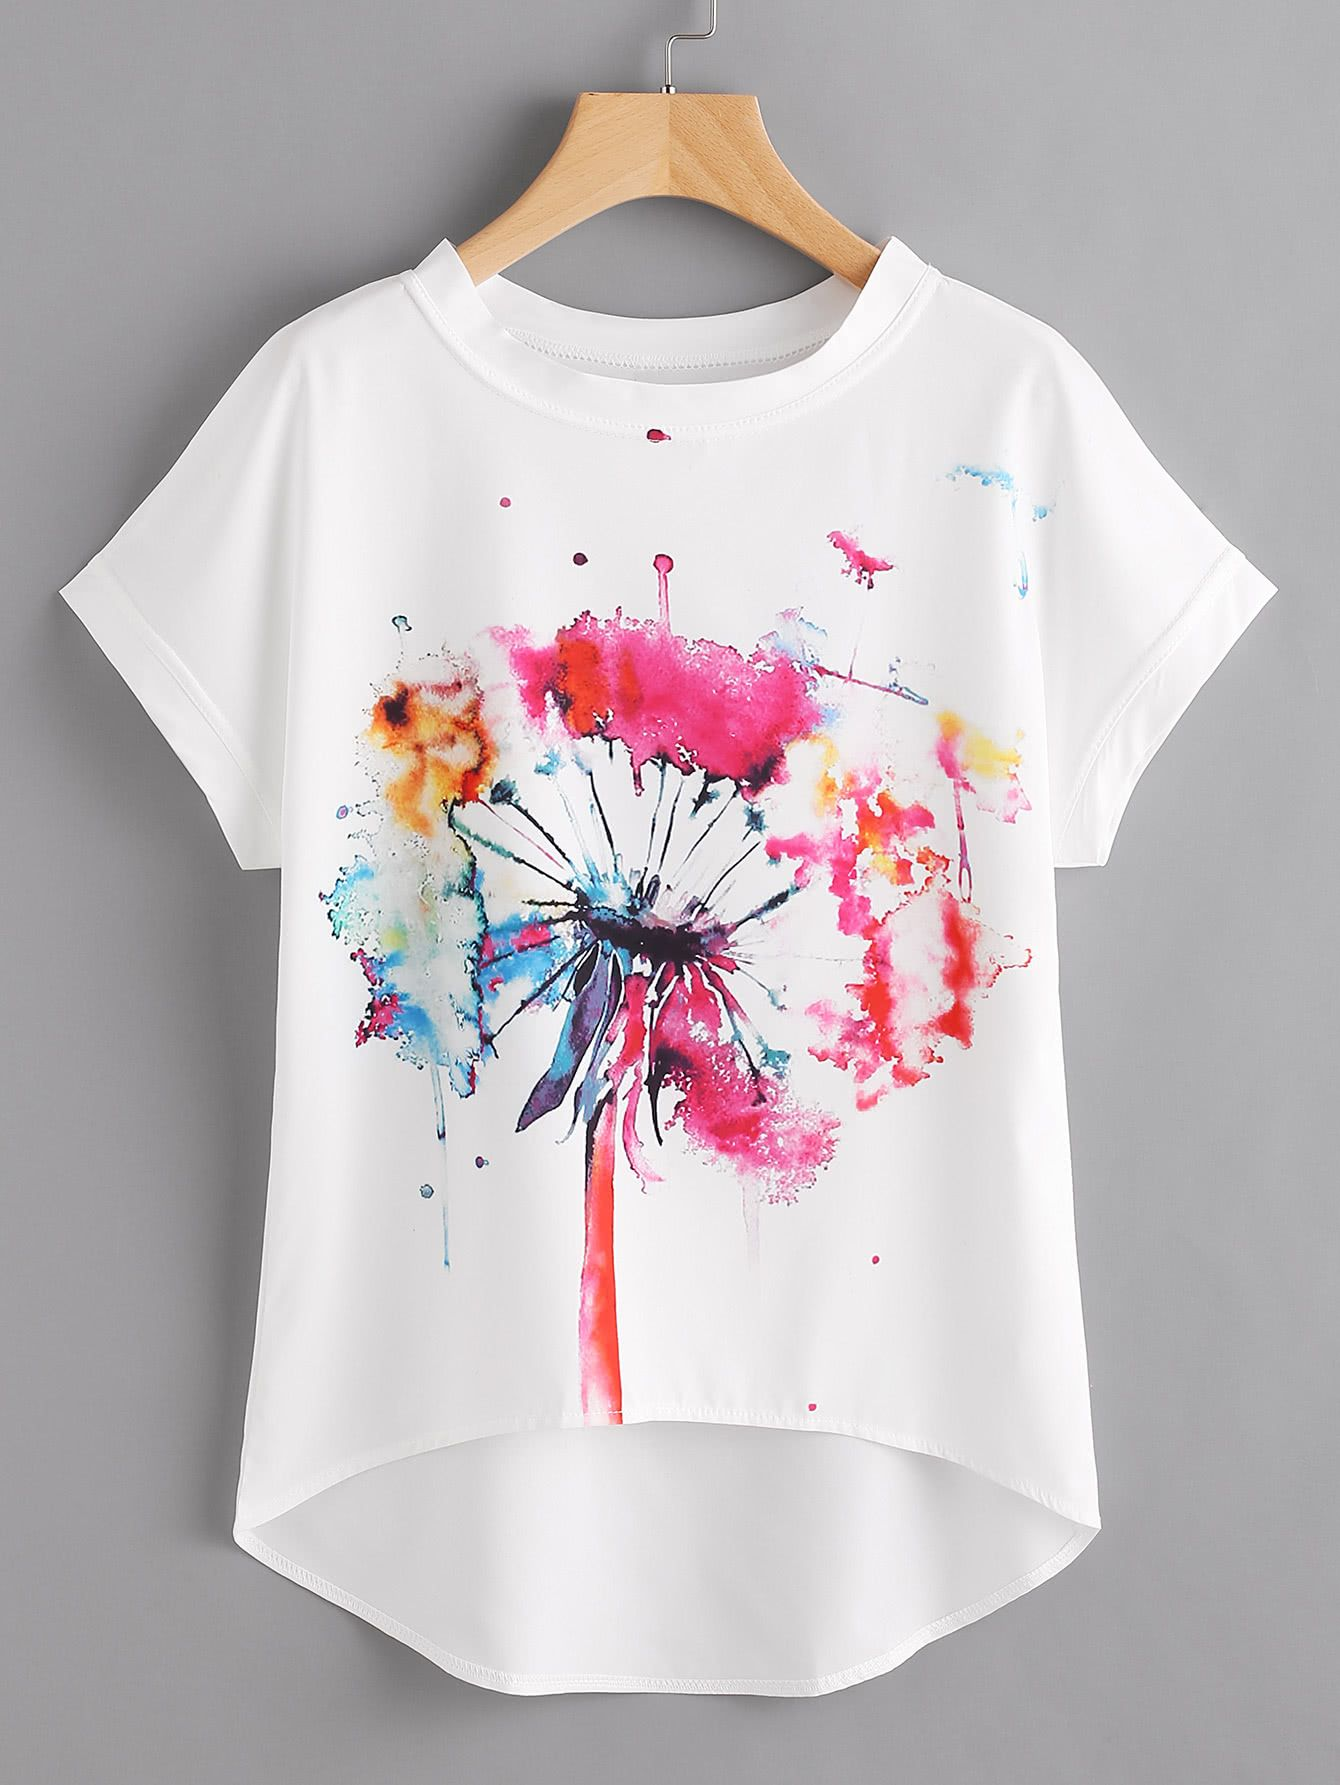 424e4401db Shop Watercolor Painting Print Dip Hem Chiffon Top EmmaCloth-Women Fast  Fashion Online